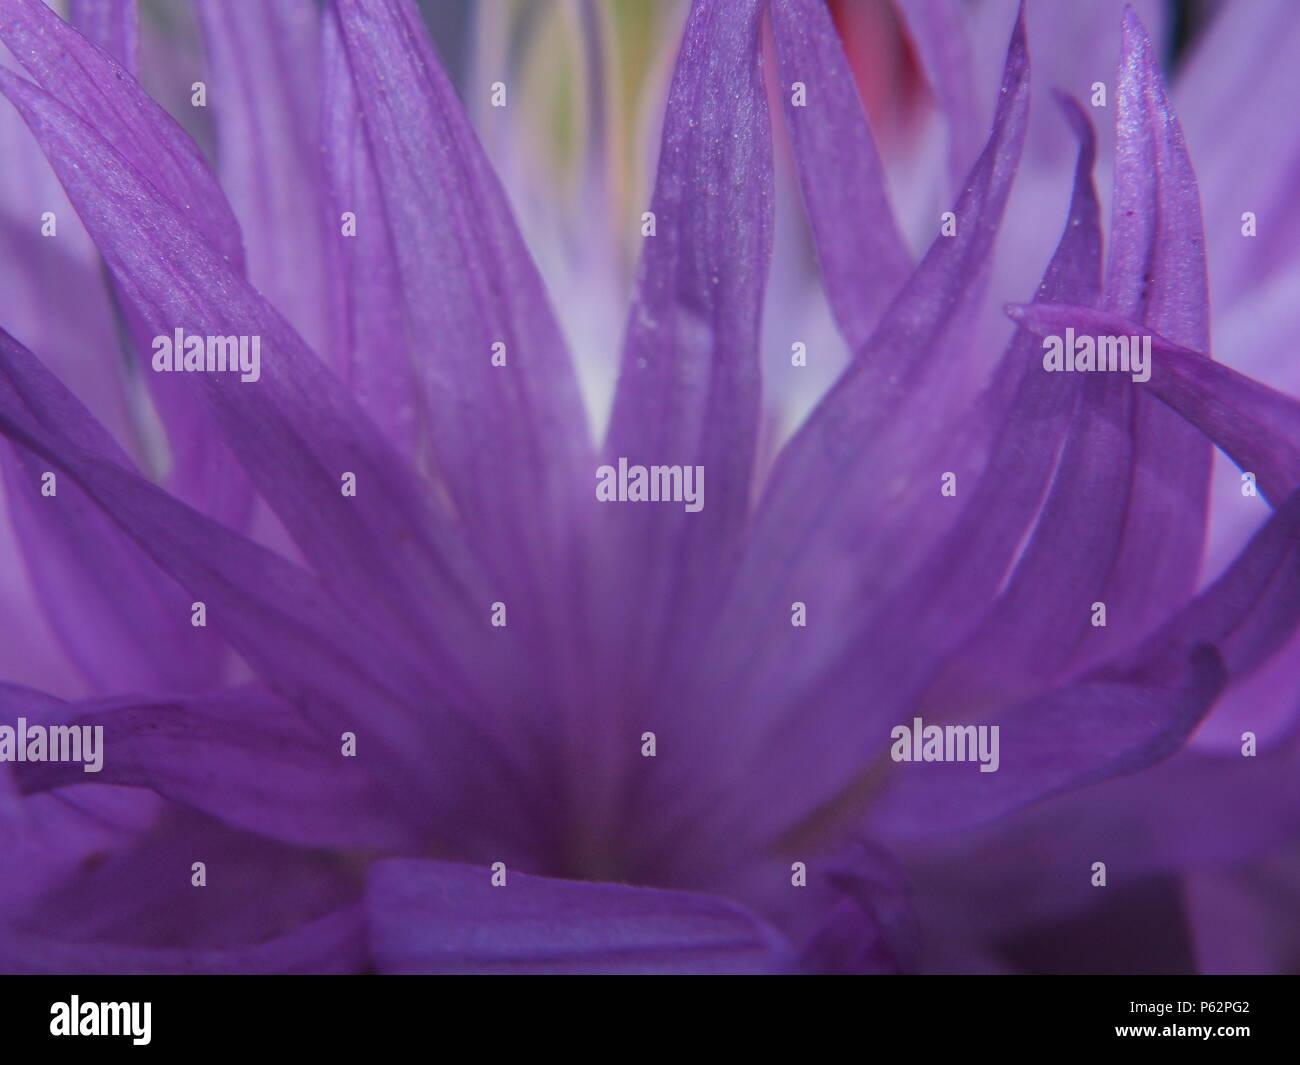 Close Up Of Petals Of Cornflower Bud Purple Flower Petals Macro